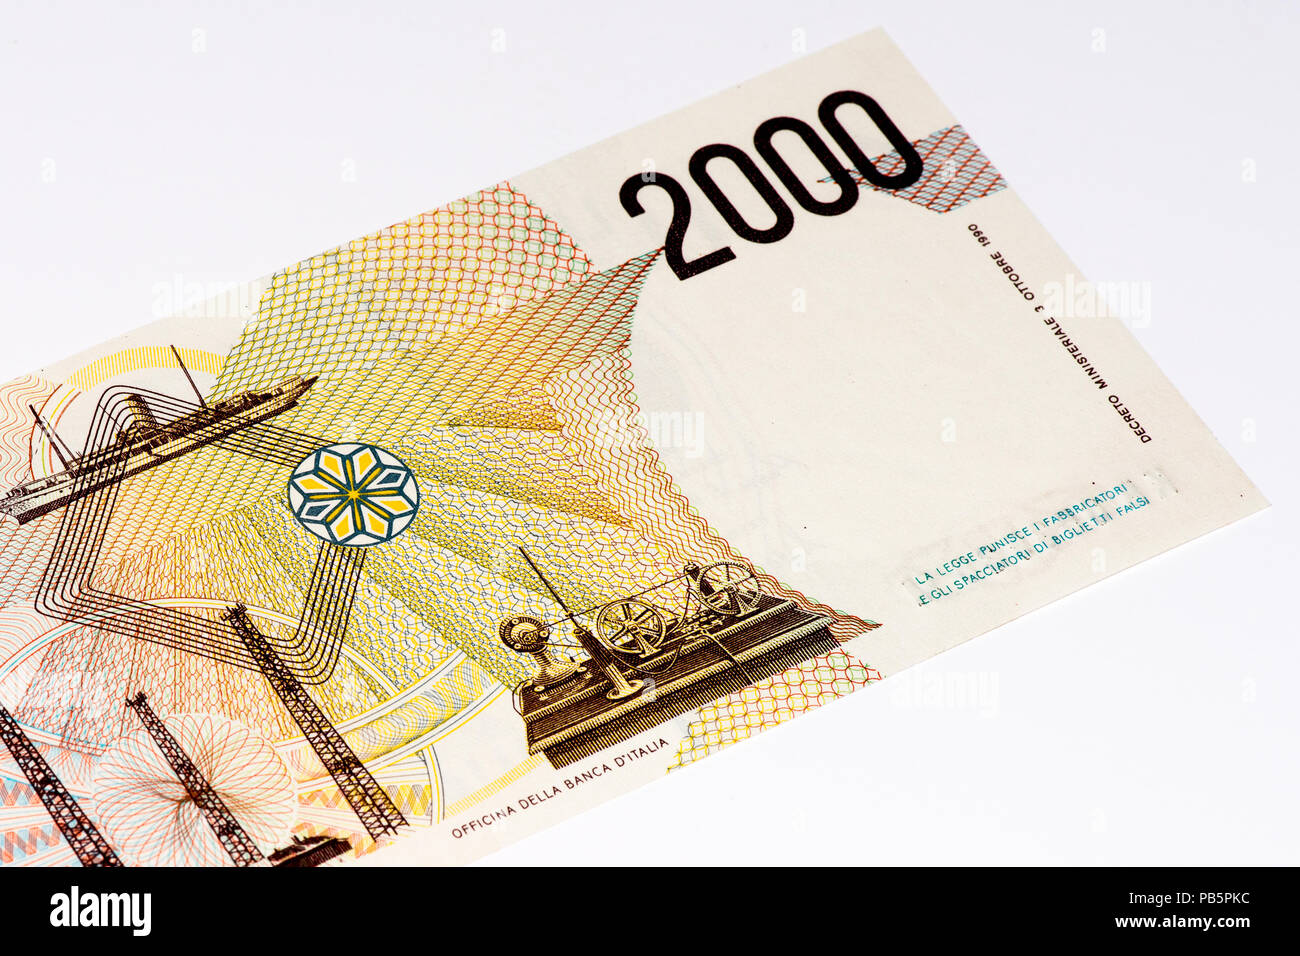 2000 italian liras. Italian liras is the former currency of Italy Stock Photo